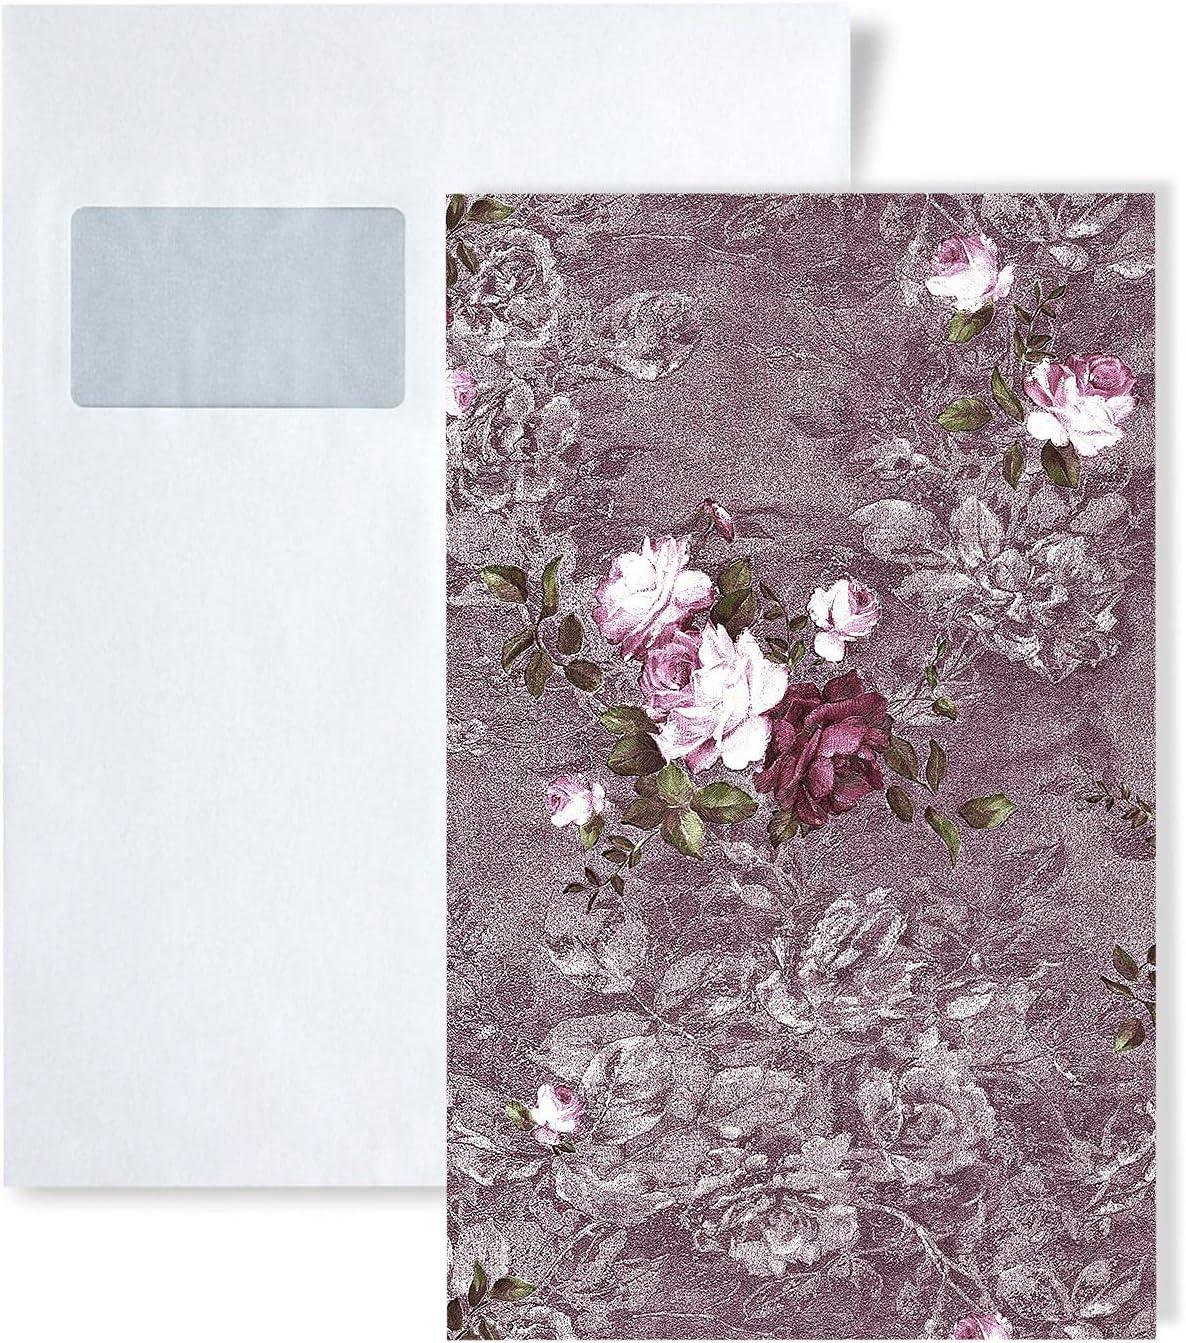 1 PIEZA DE MUESTRA S-9045-25 EDEM STATUS Papel pintado flores romántico | MUESTRA de Papel pintado en tamaño aprox DIN A4